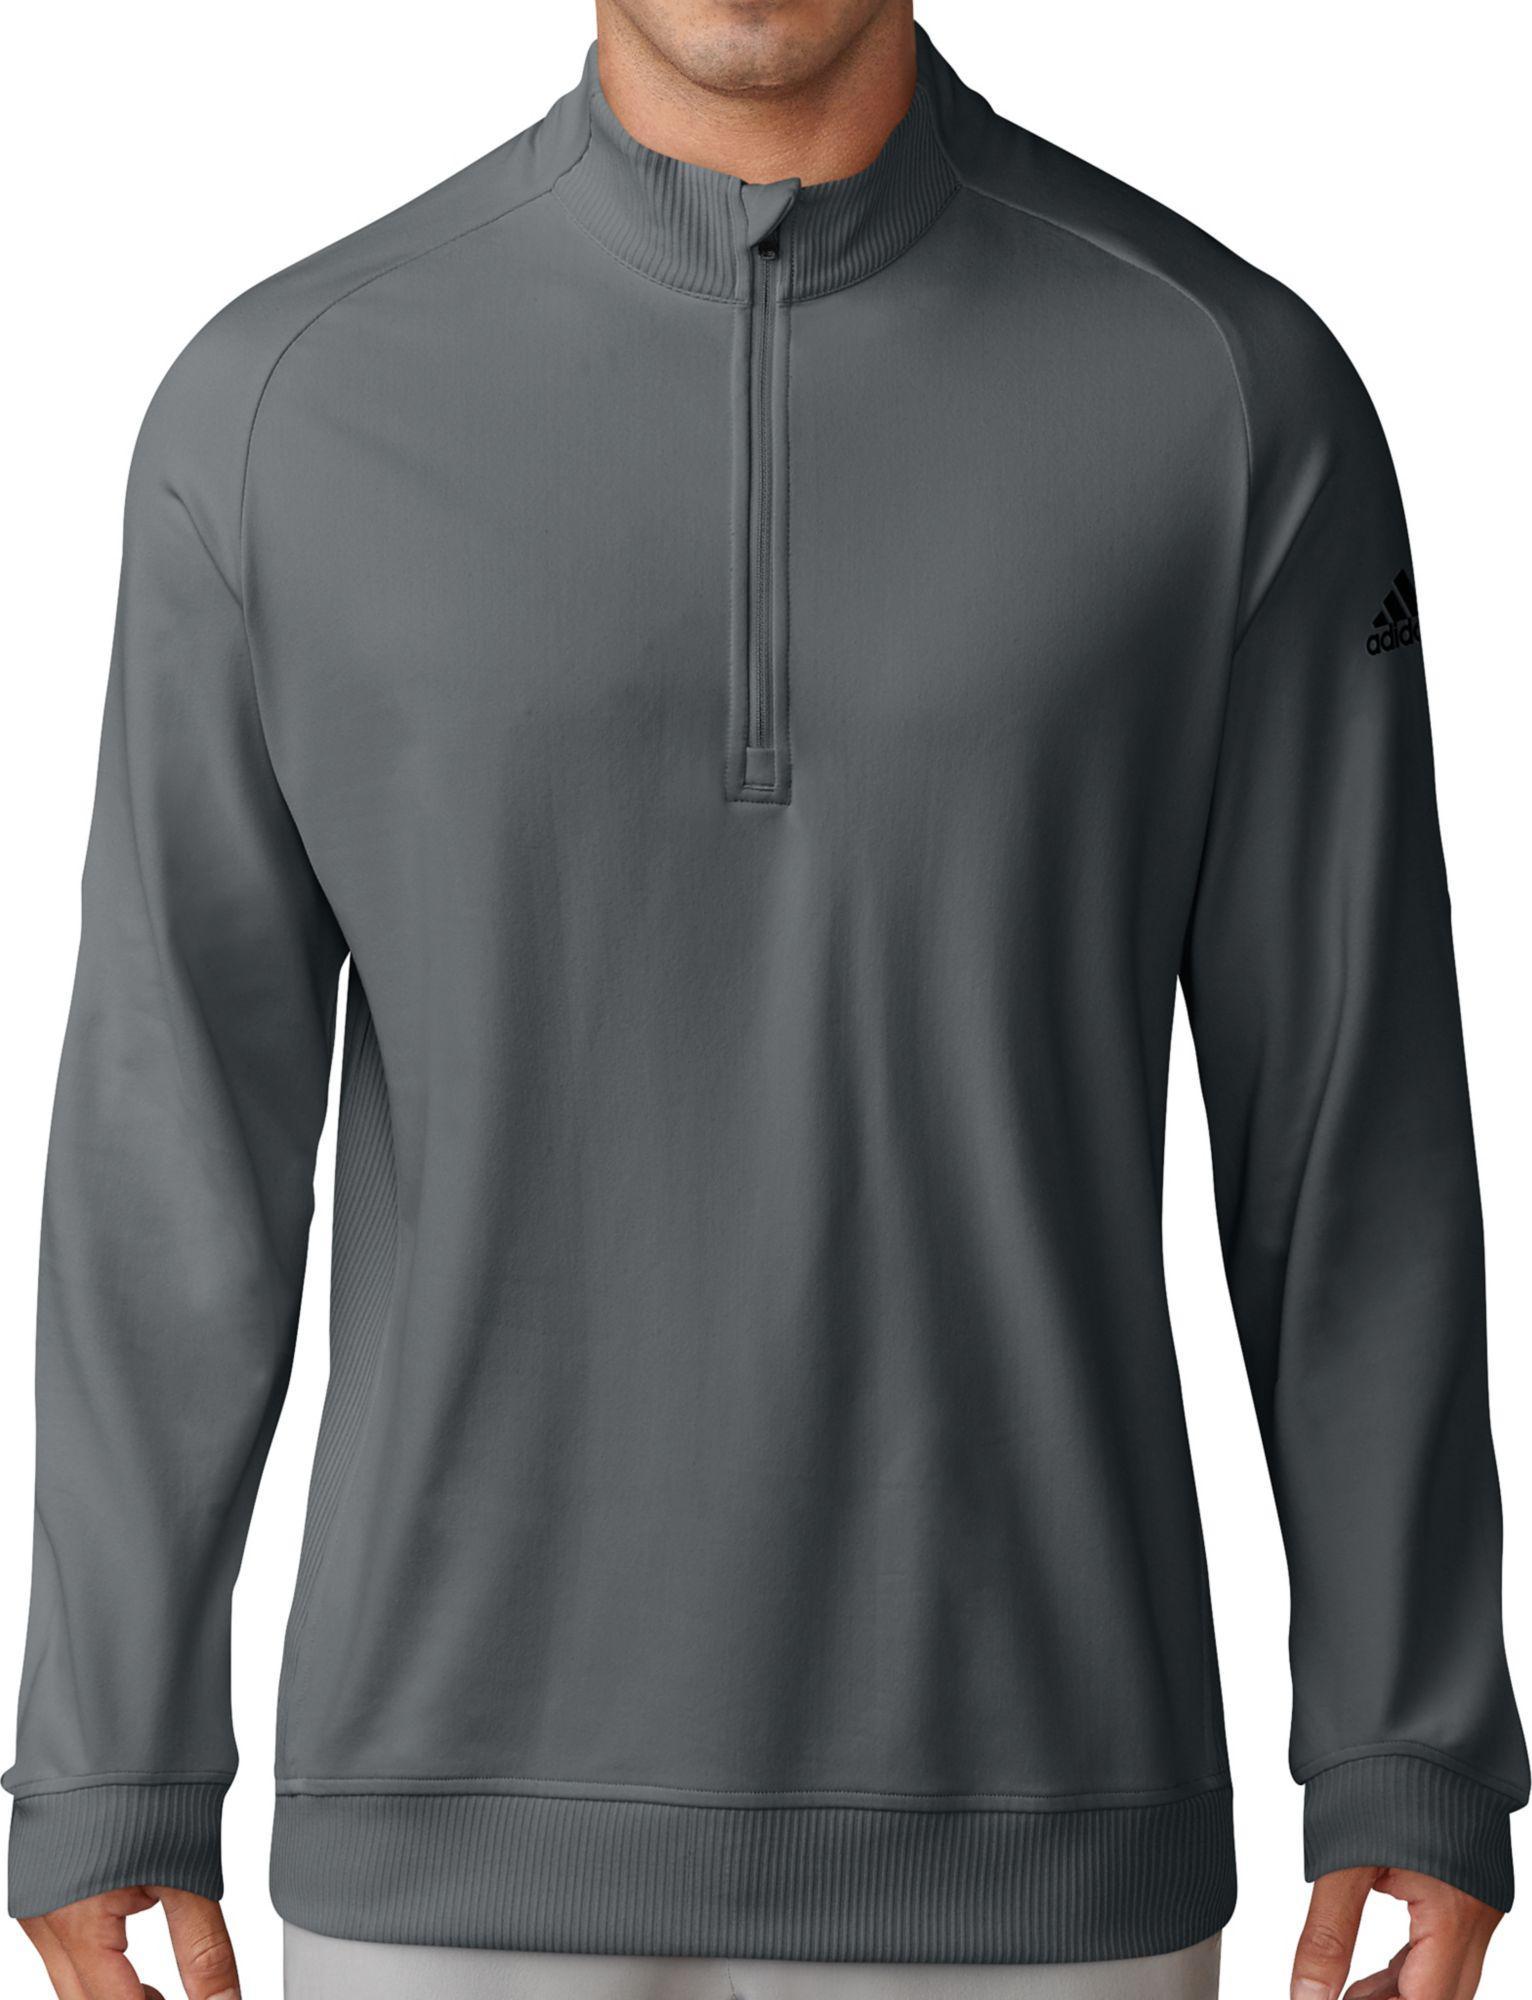 6d6b1d082f31 Lyst - adidas Classic Club Quarter-zip Golf Pullover in Gray for Men